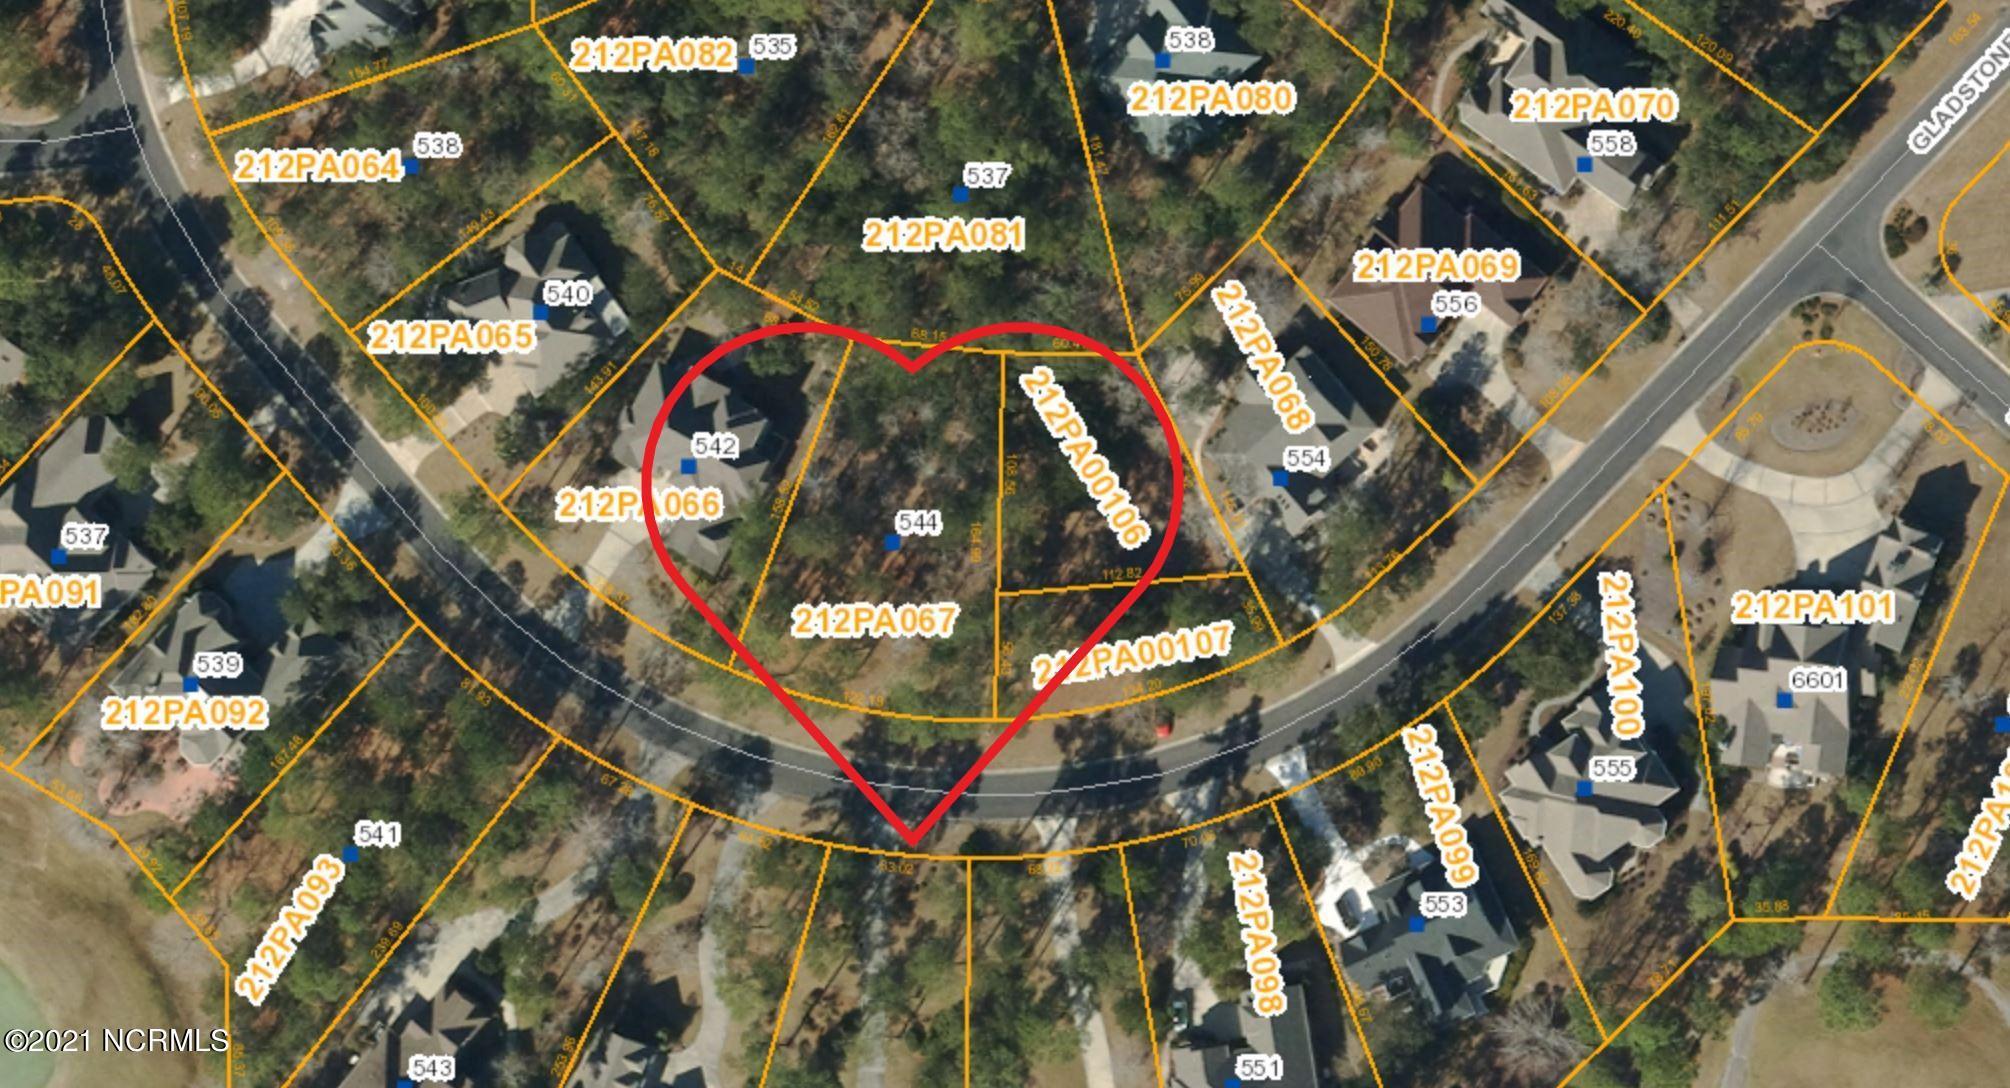 544 Gladstone Circle, Ocean Isle Beach, North Carolina 28469, ,Residential land,For sale,Gladstone,100286375